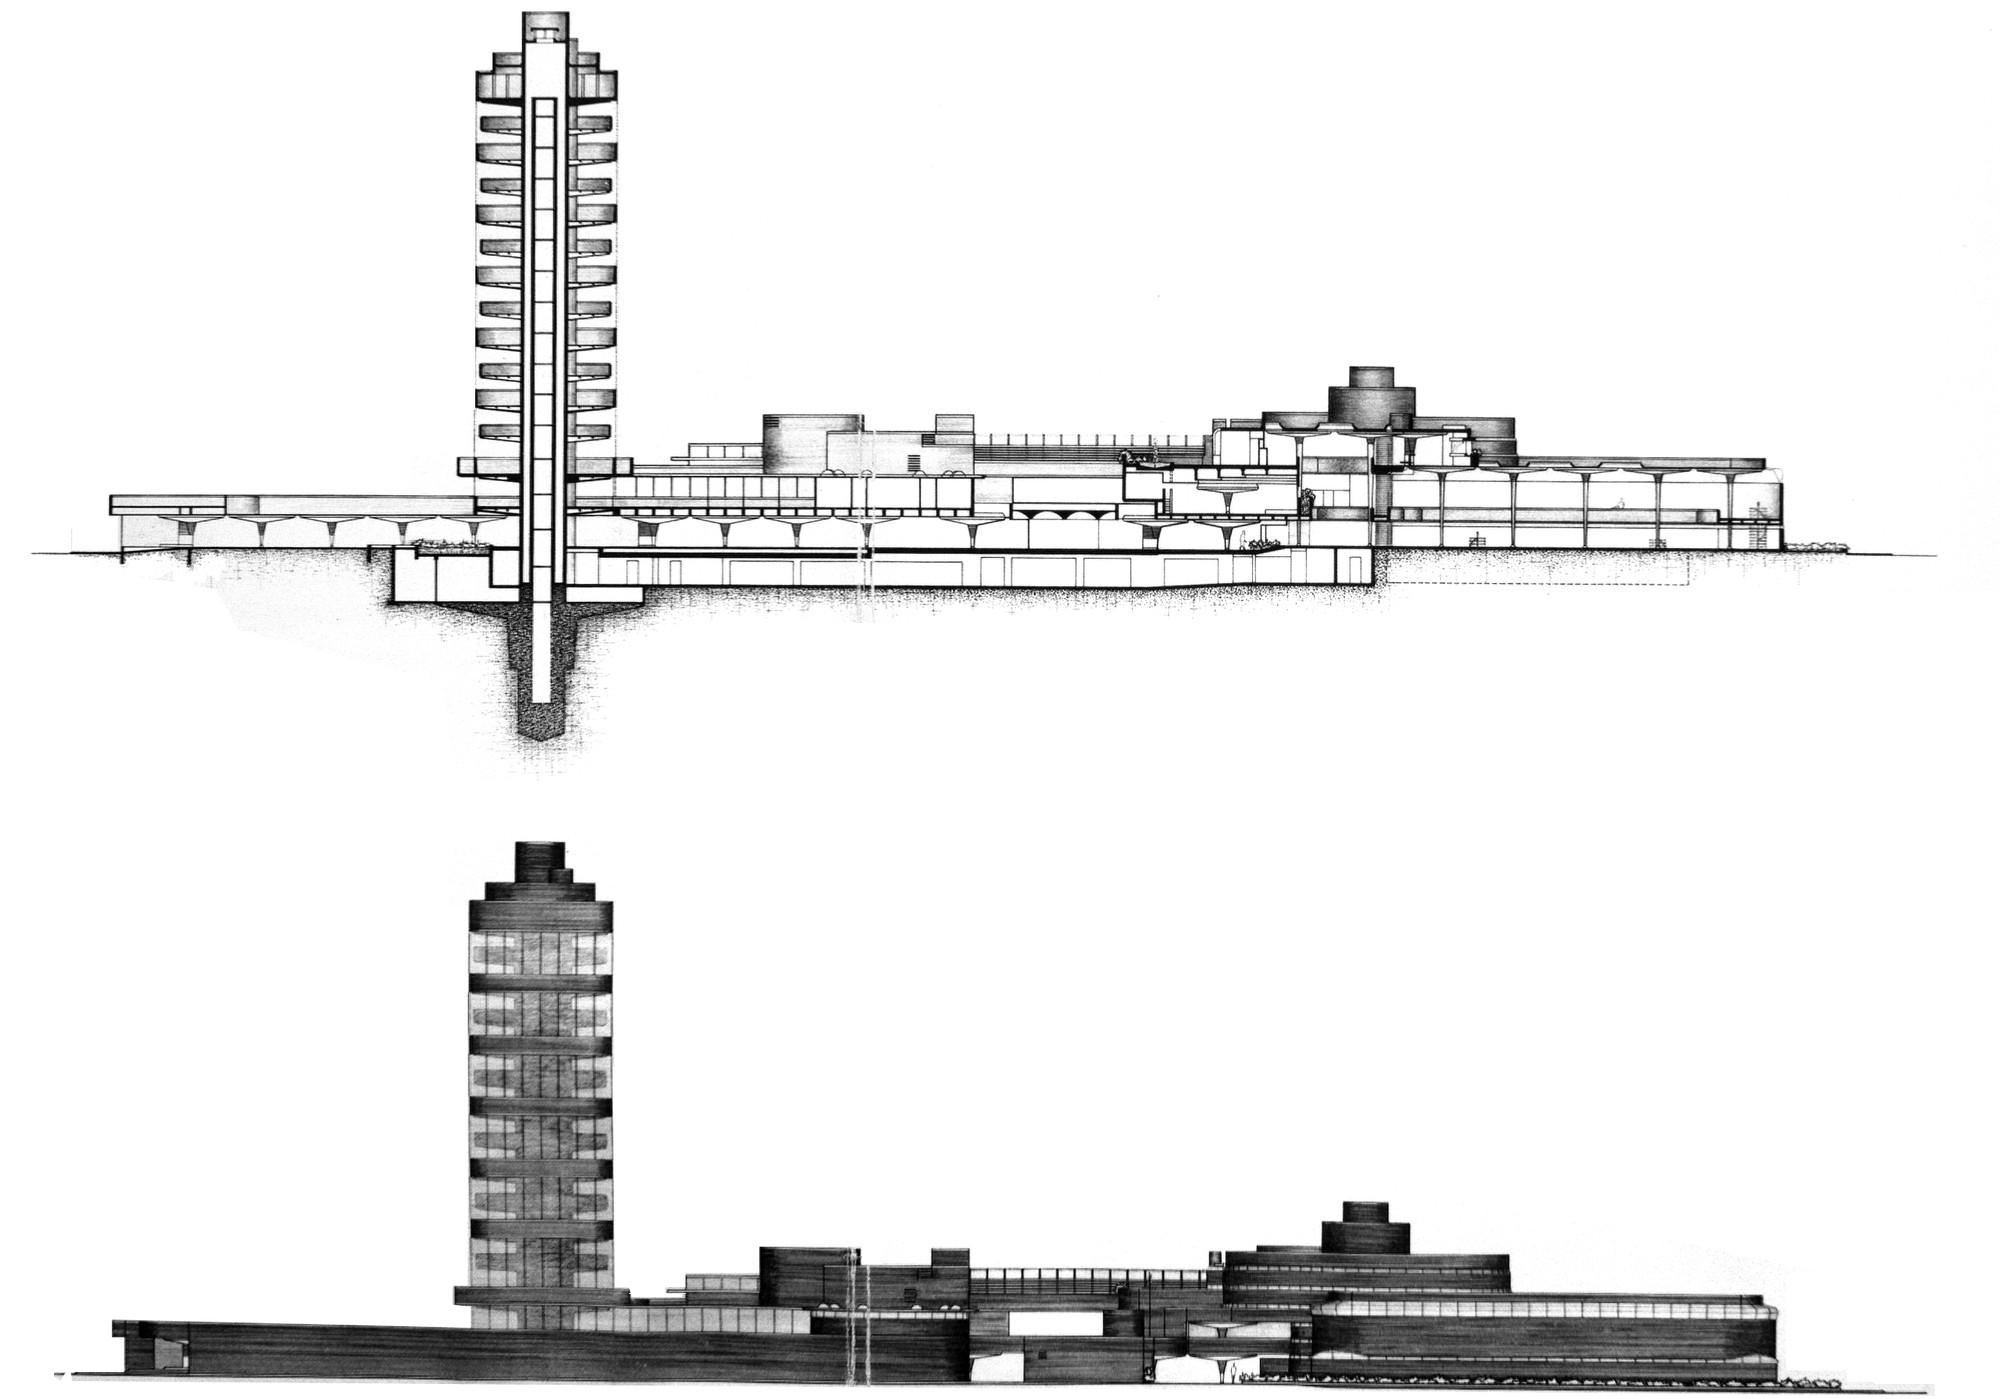 Create Floor Plans Ad Classics Sc Johnson Wax Research Tower Frank Lloyd